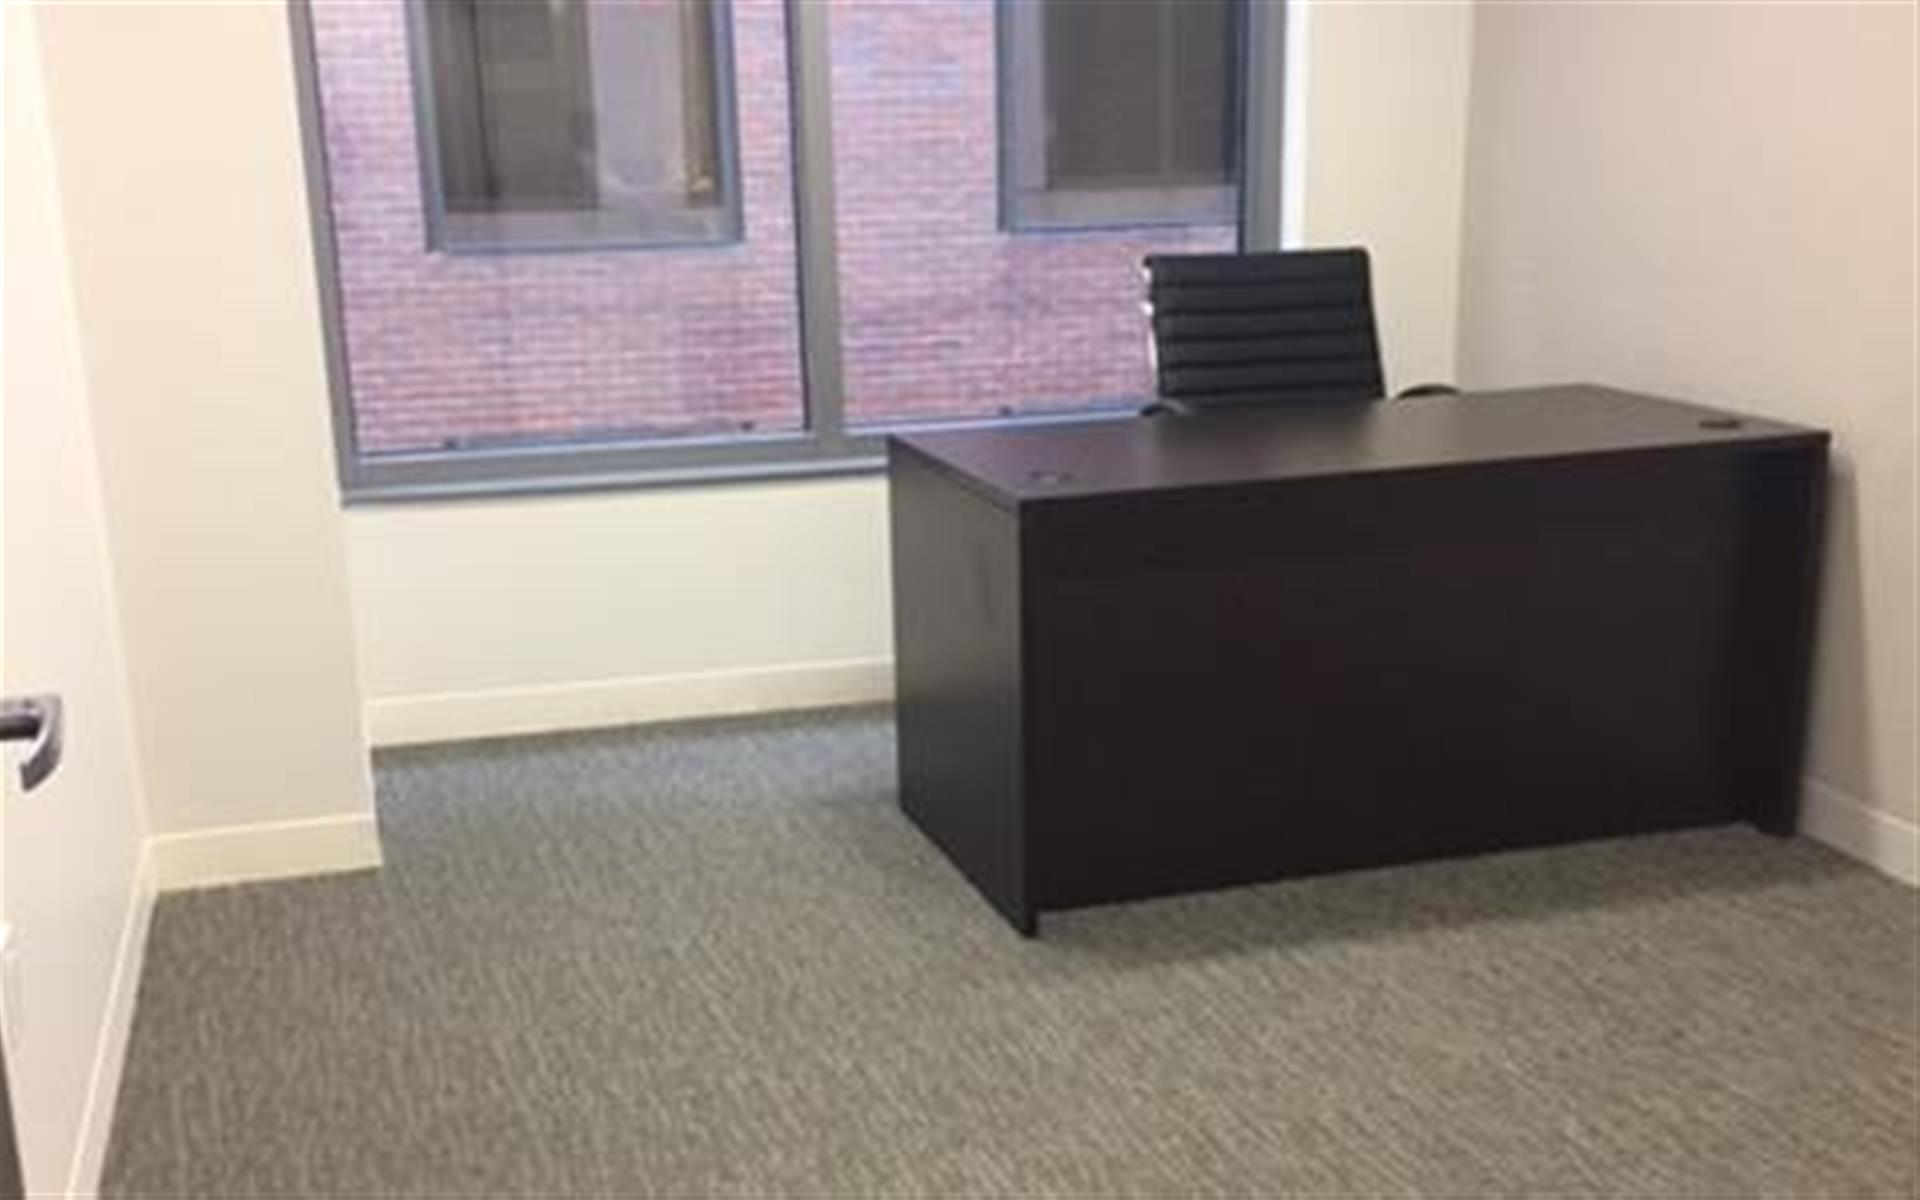 Centurion Center DC - Suite E6 - Windowed Office